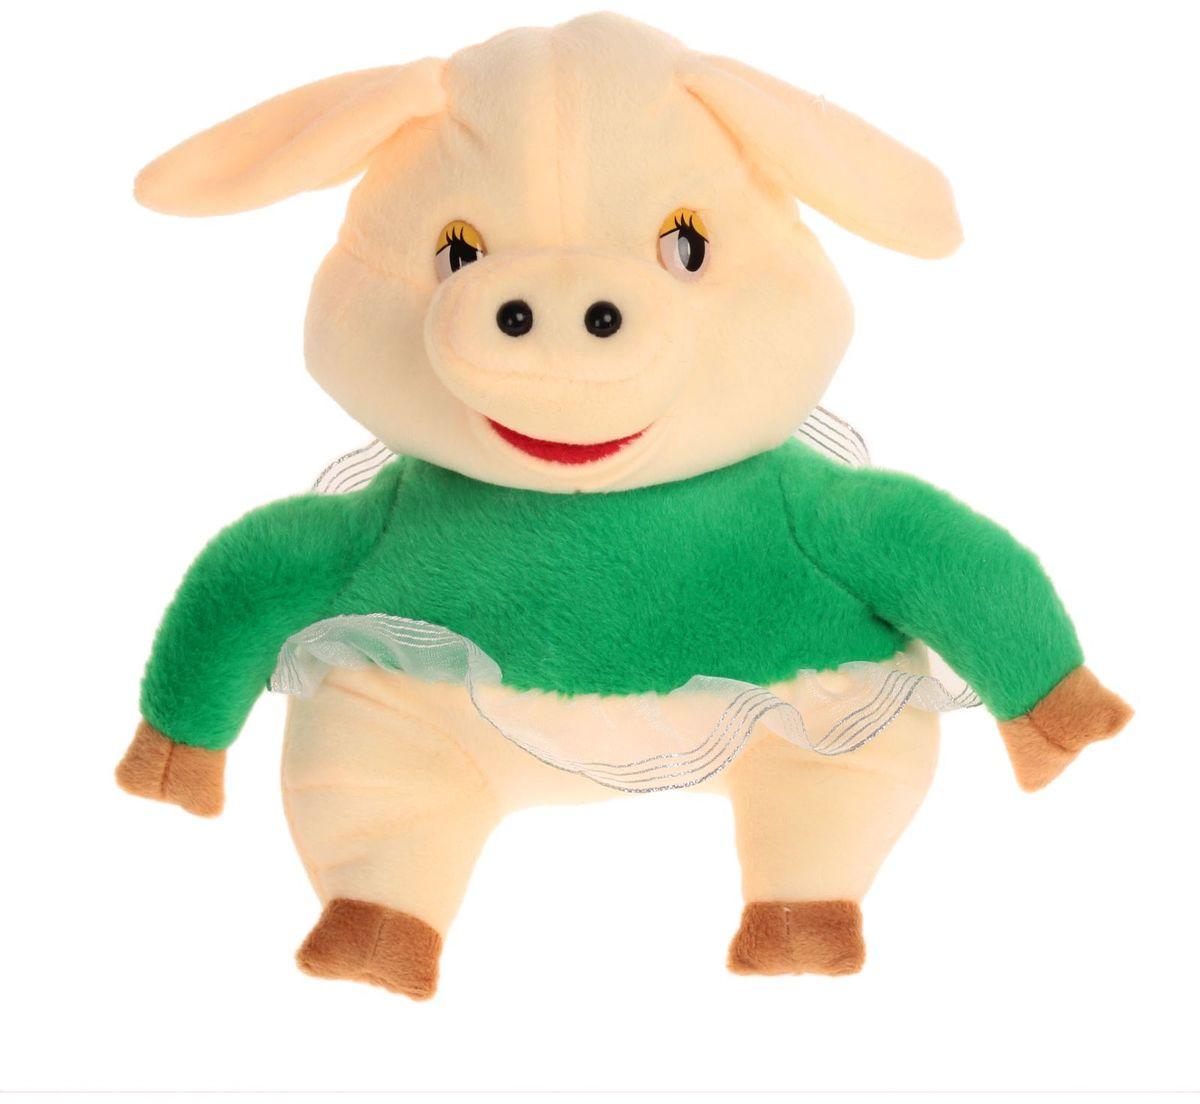 Радомир Мягкая игрушка Свинка Матильда 22 см 2008839 радомир мягкая игрушка собака соня 55 см 2008906